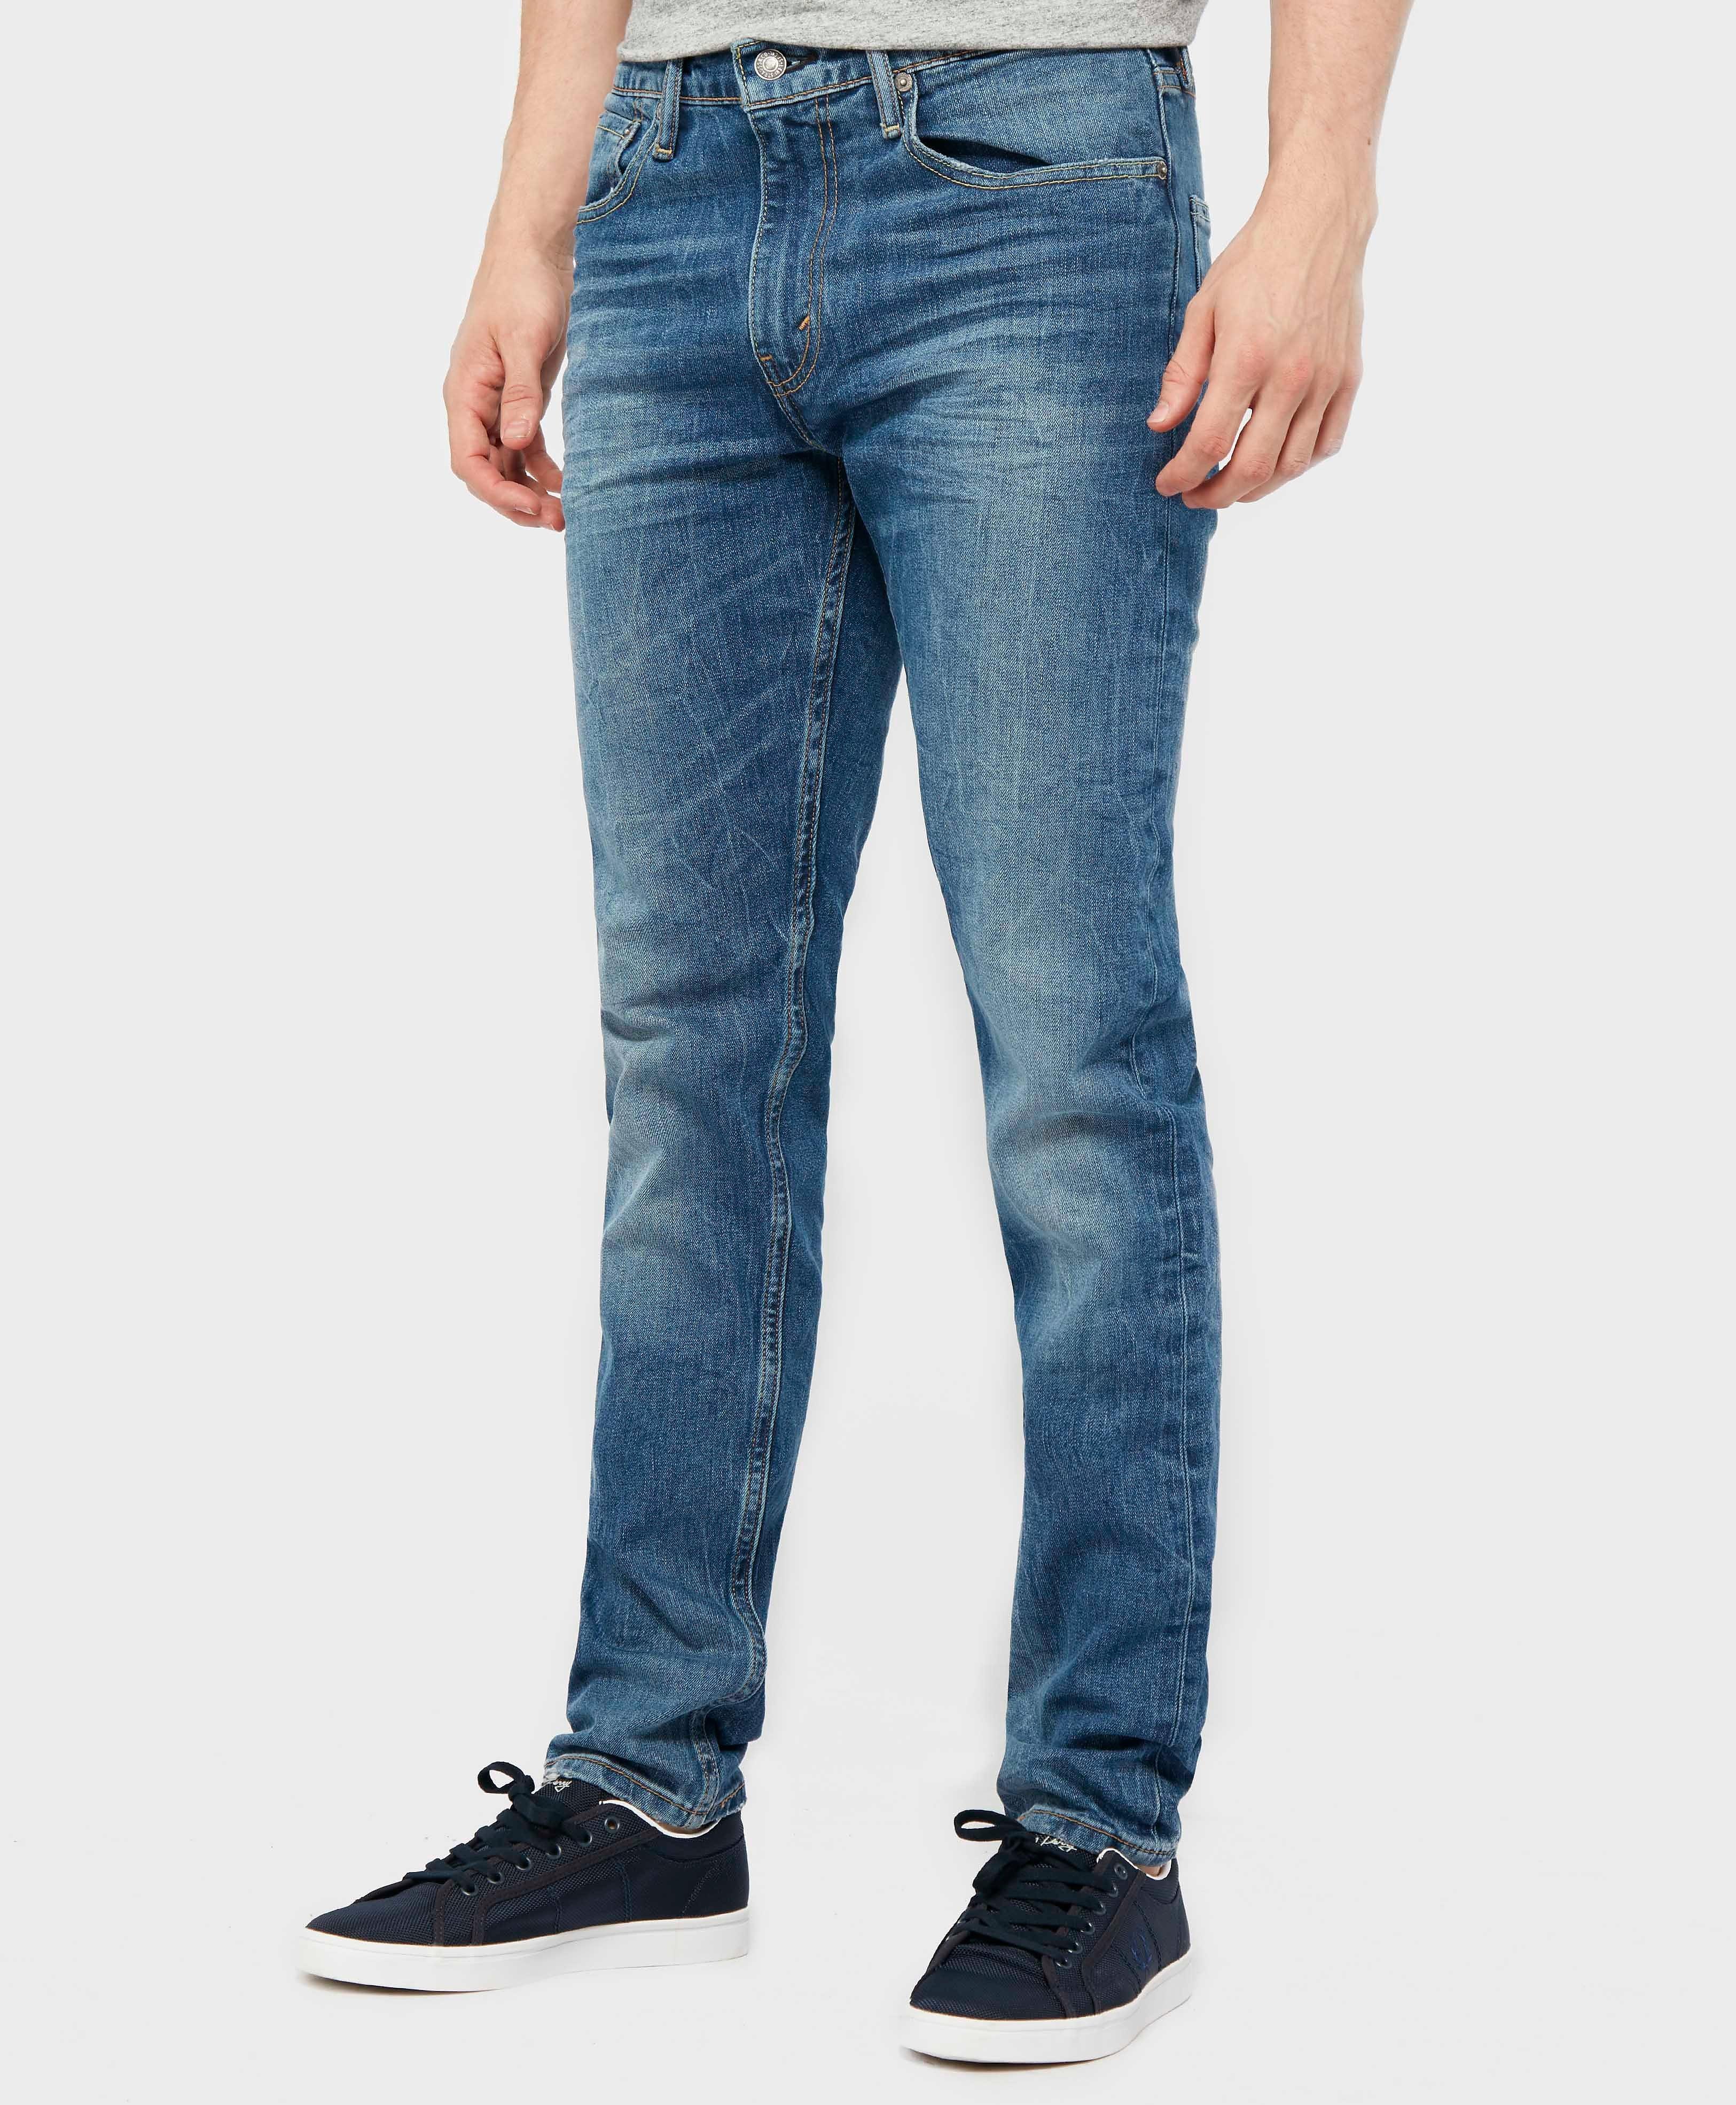 Levis 512 Taper Jeans